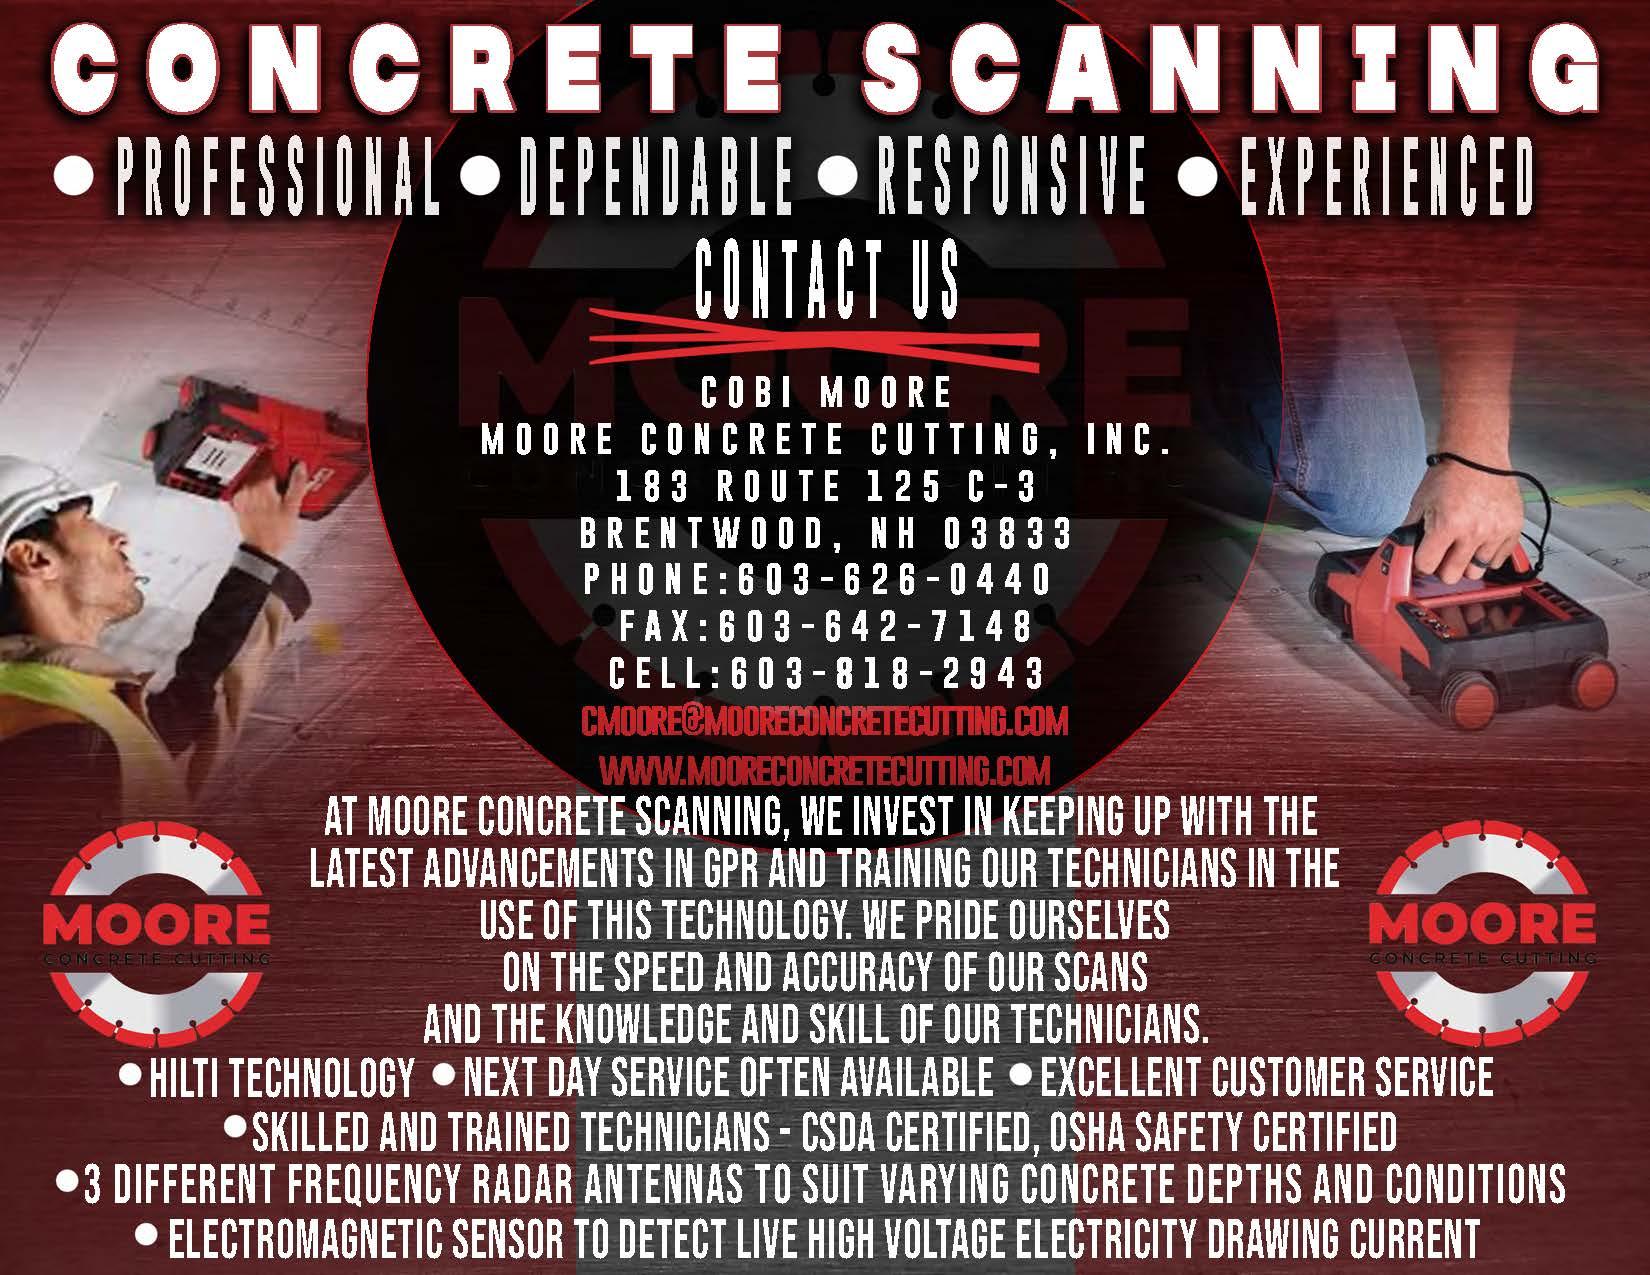 Concrete Scanning-ma-nh-me